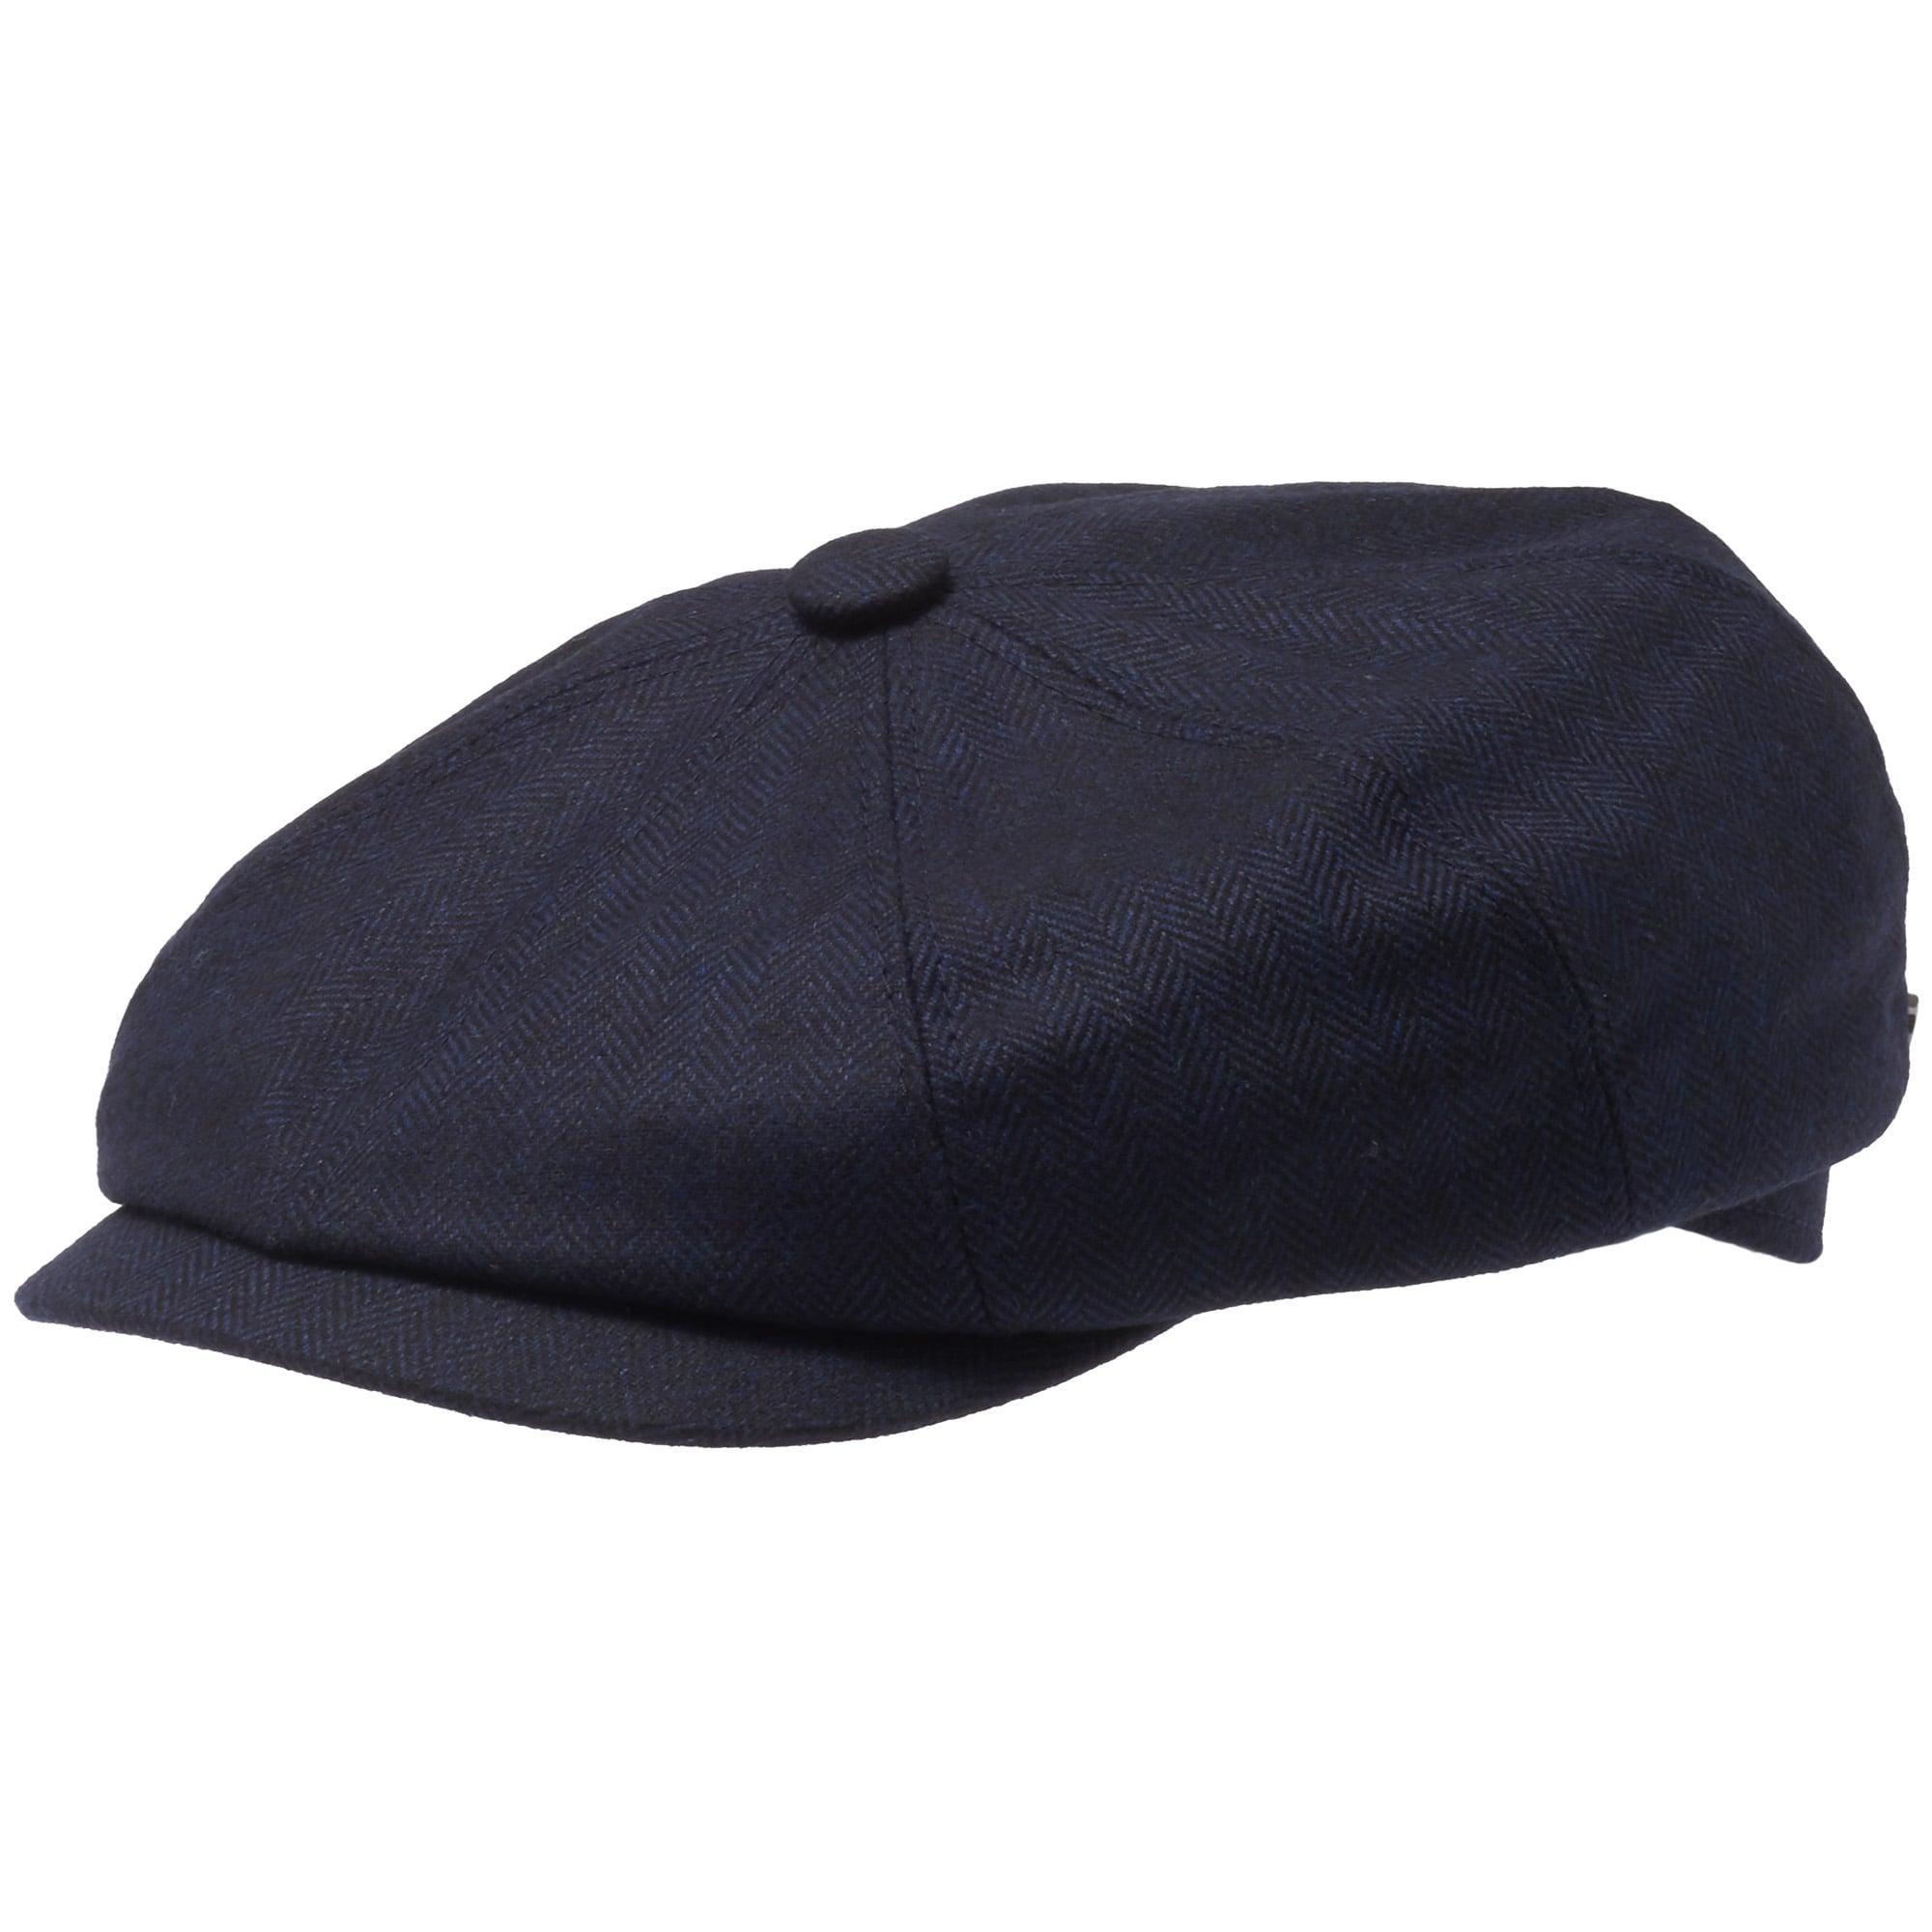 Stetson Navy Wool and Silk Hattera 6840501  1ebd785a5935